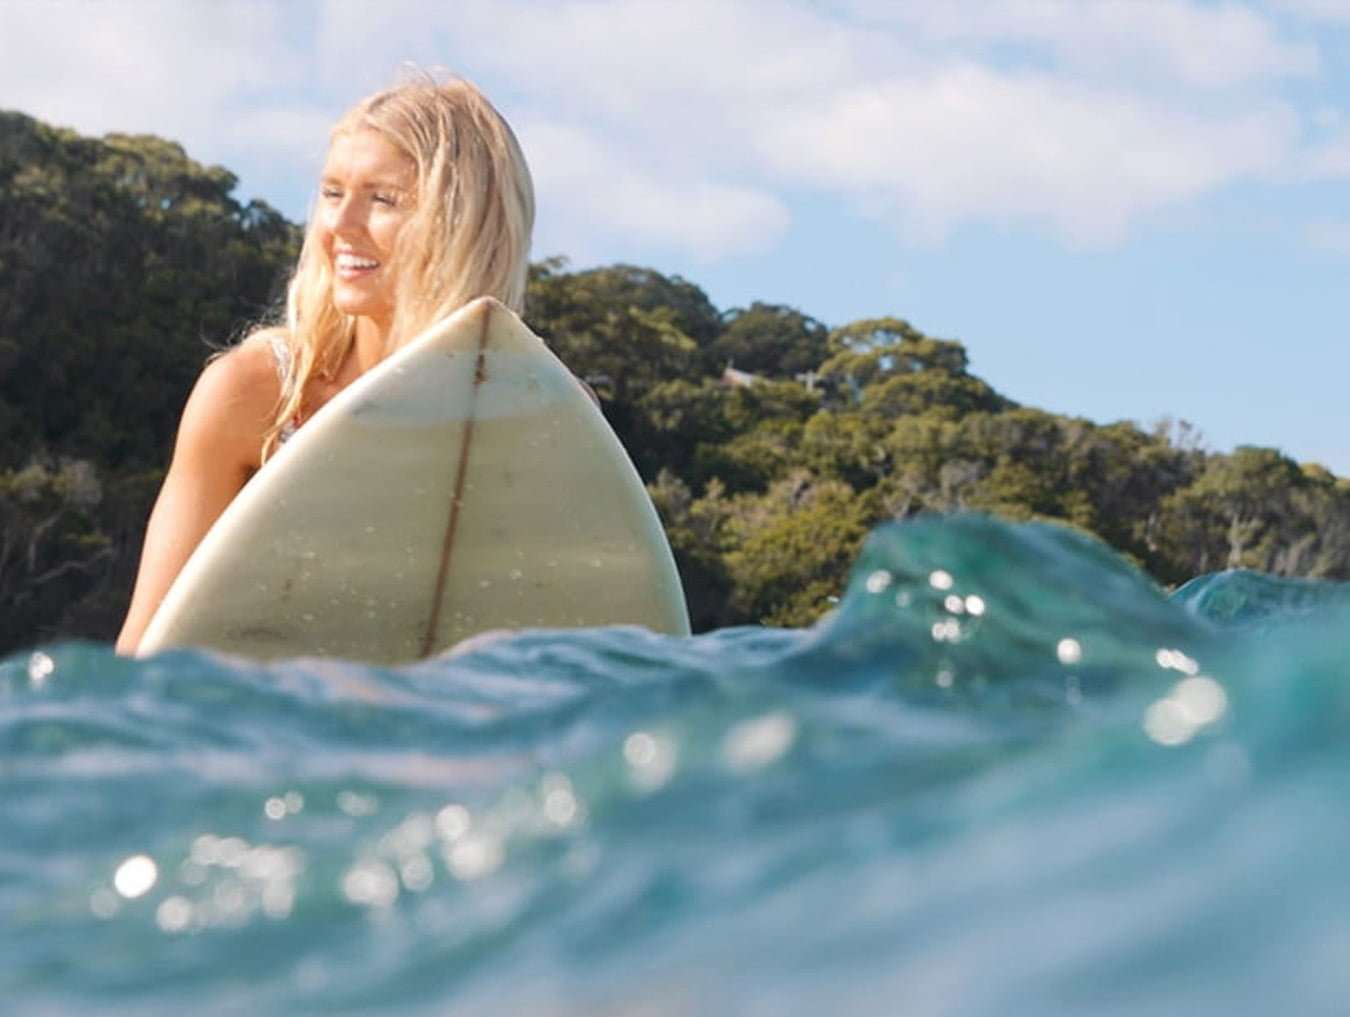 Surfing-And-Byron-Bay-A-Natural-Partnership-1350x1017.jpg